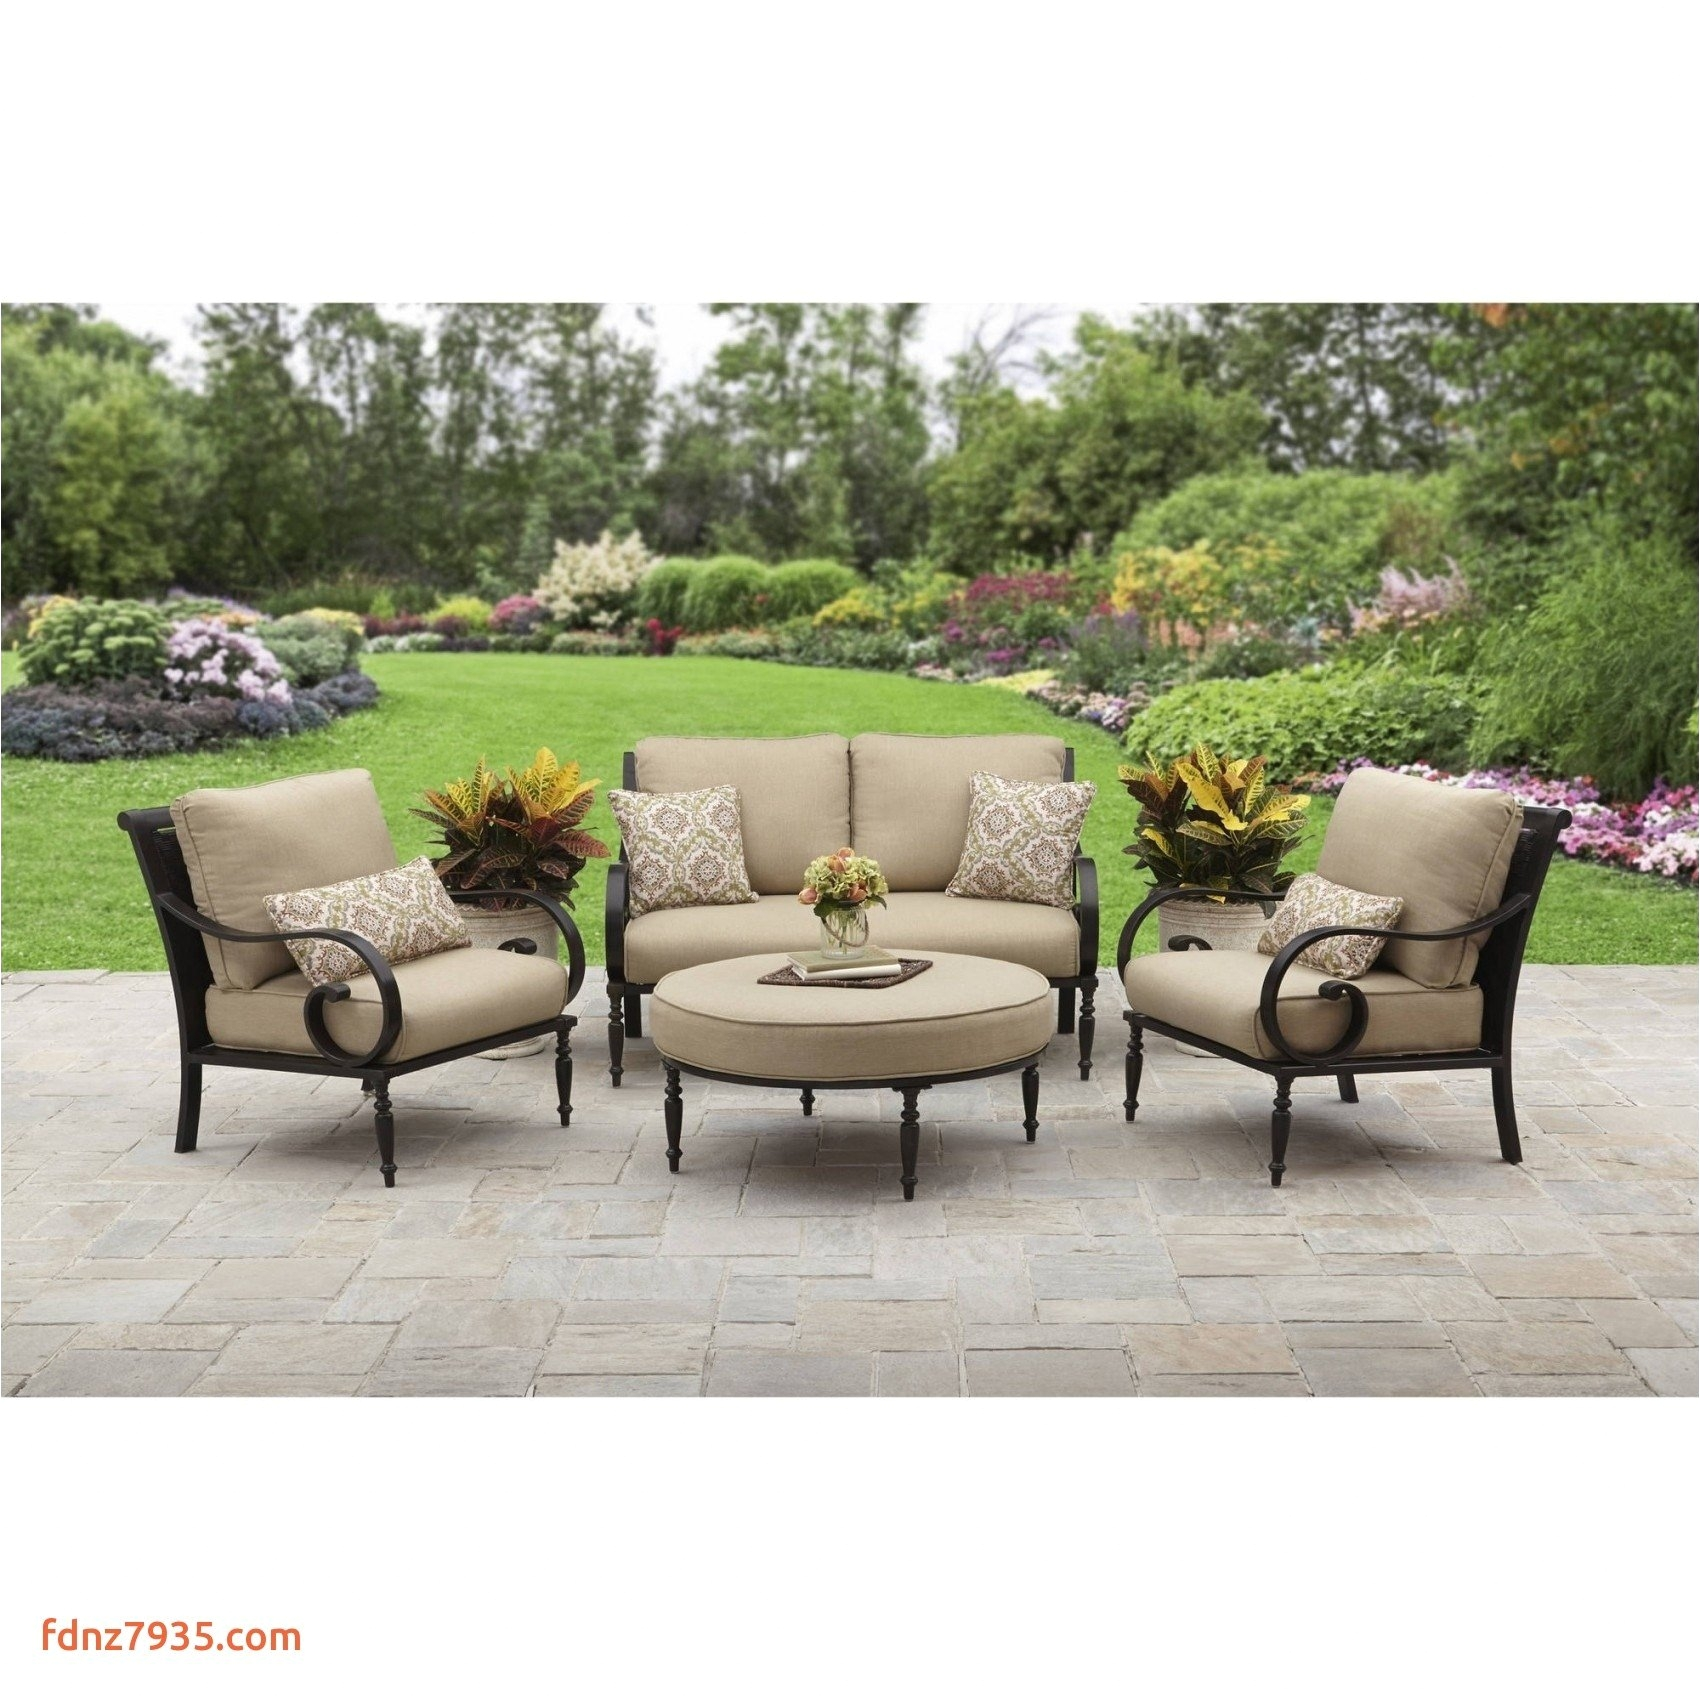 Mid Century Sectional sofa Mid Century Style Sectional Curved Modern Sectional sofa Fresh sofa